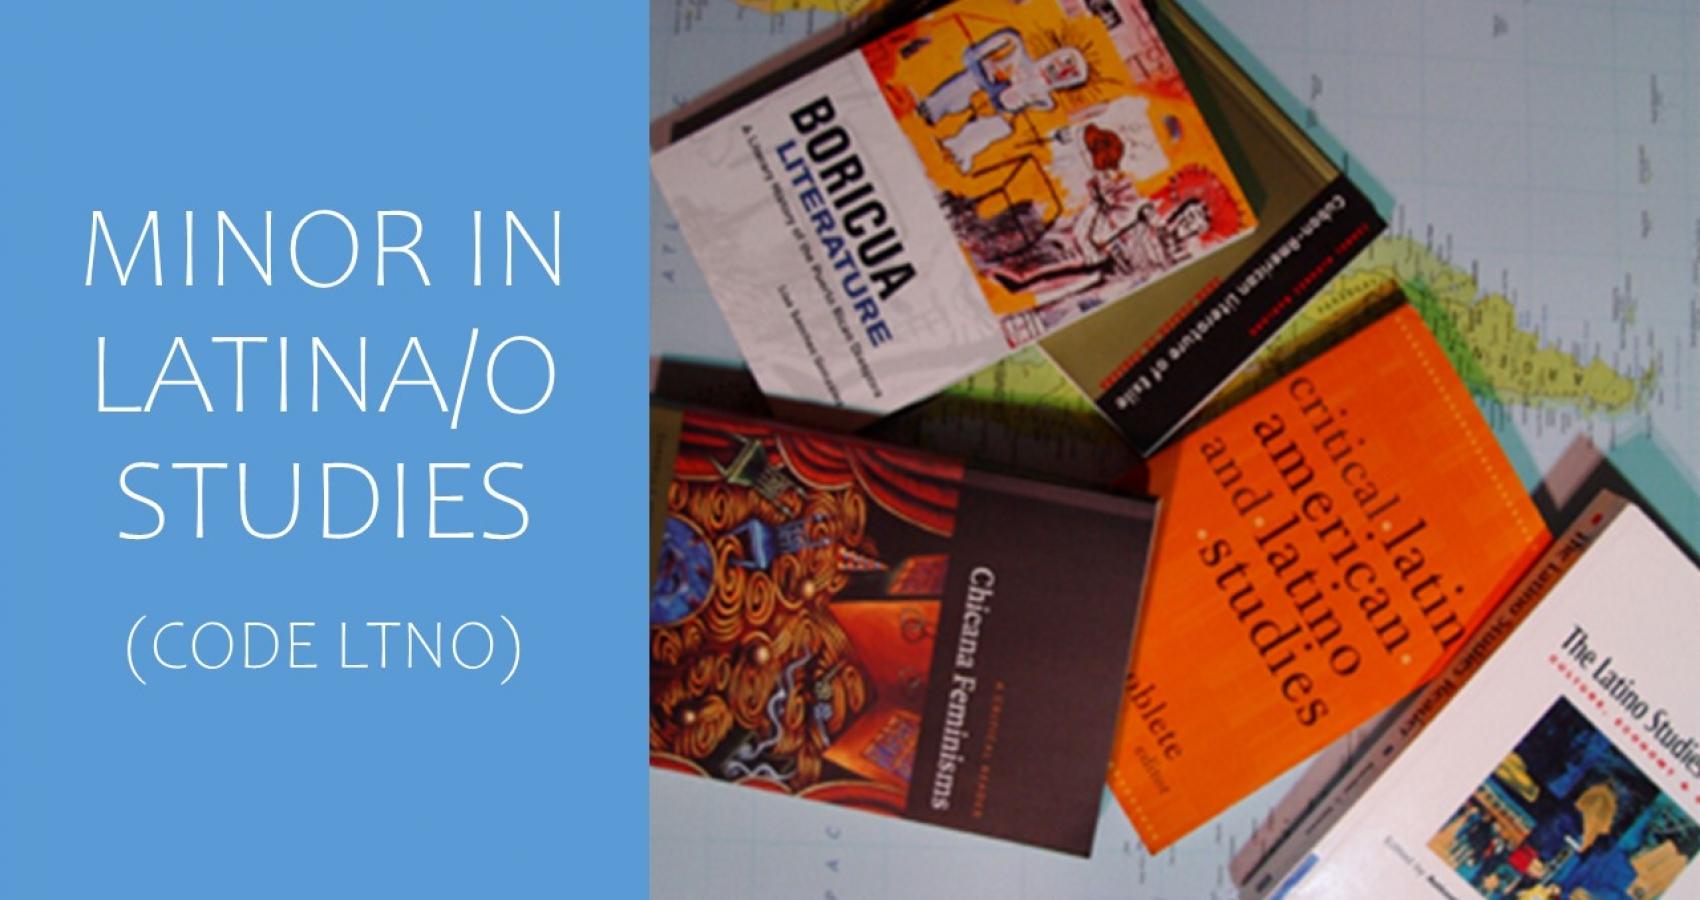 Minor in Latinao studies LTNO